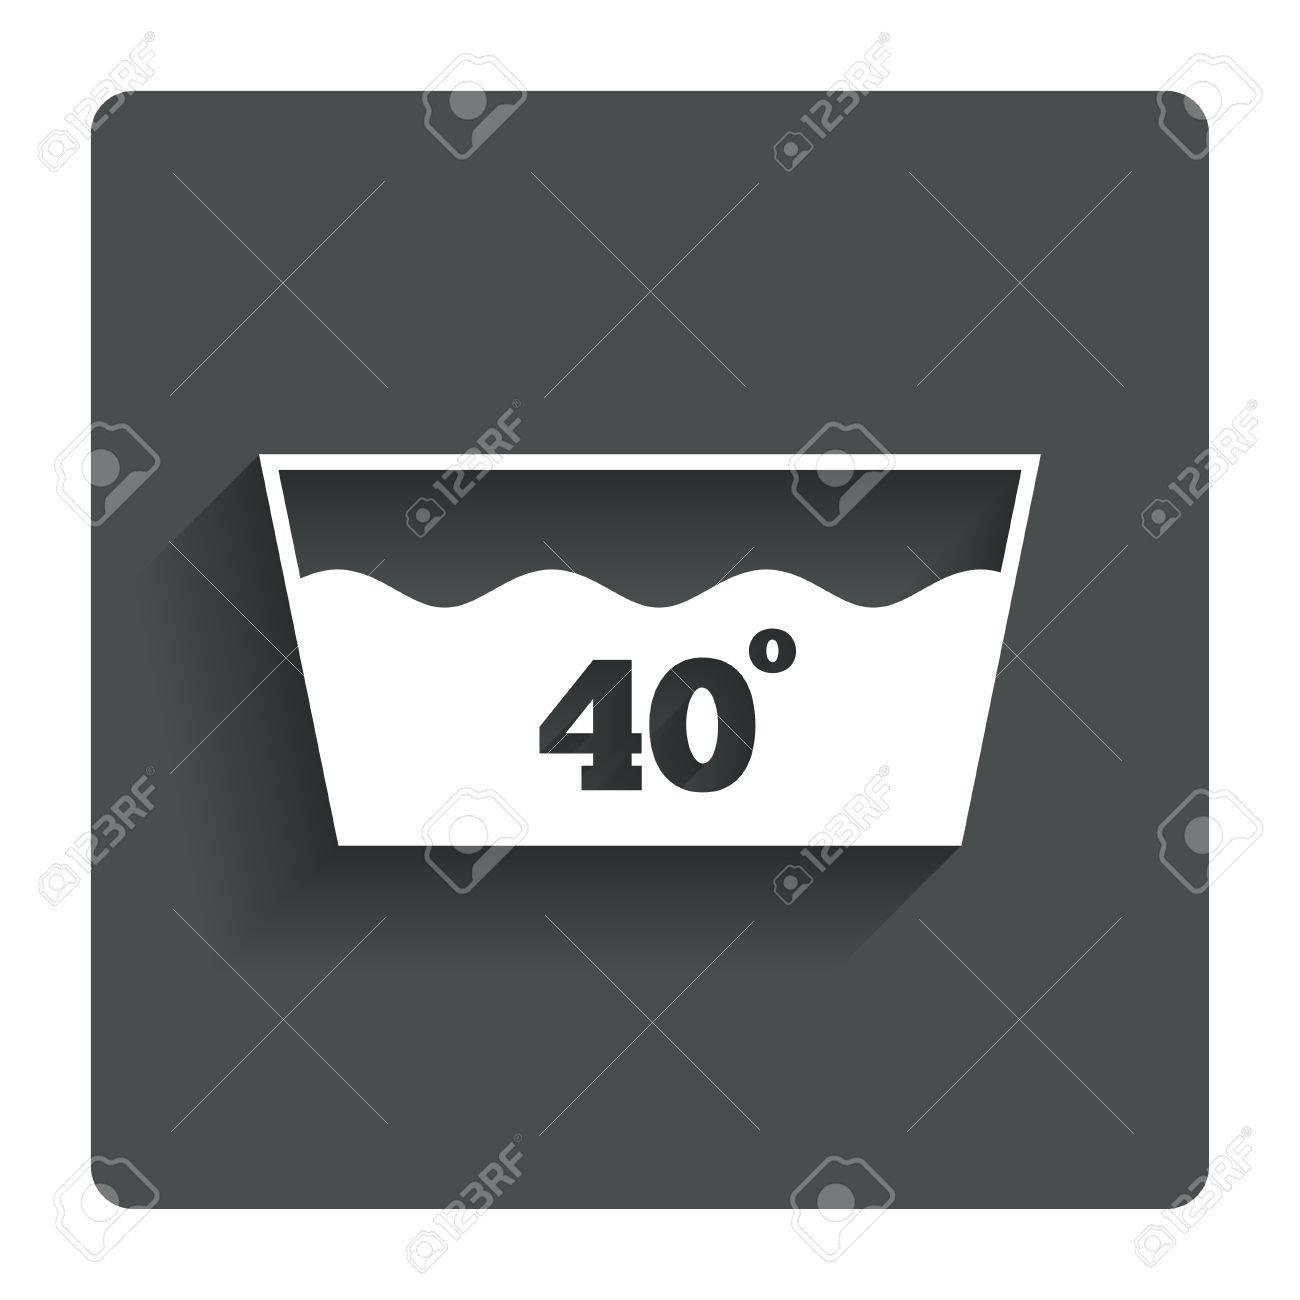 Wash Icon Machine Washable At 40 Degrees Symbol Stock Photo